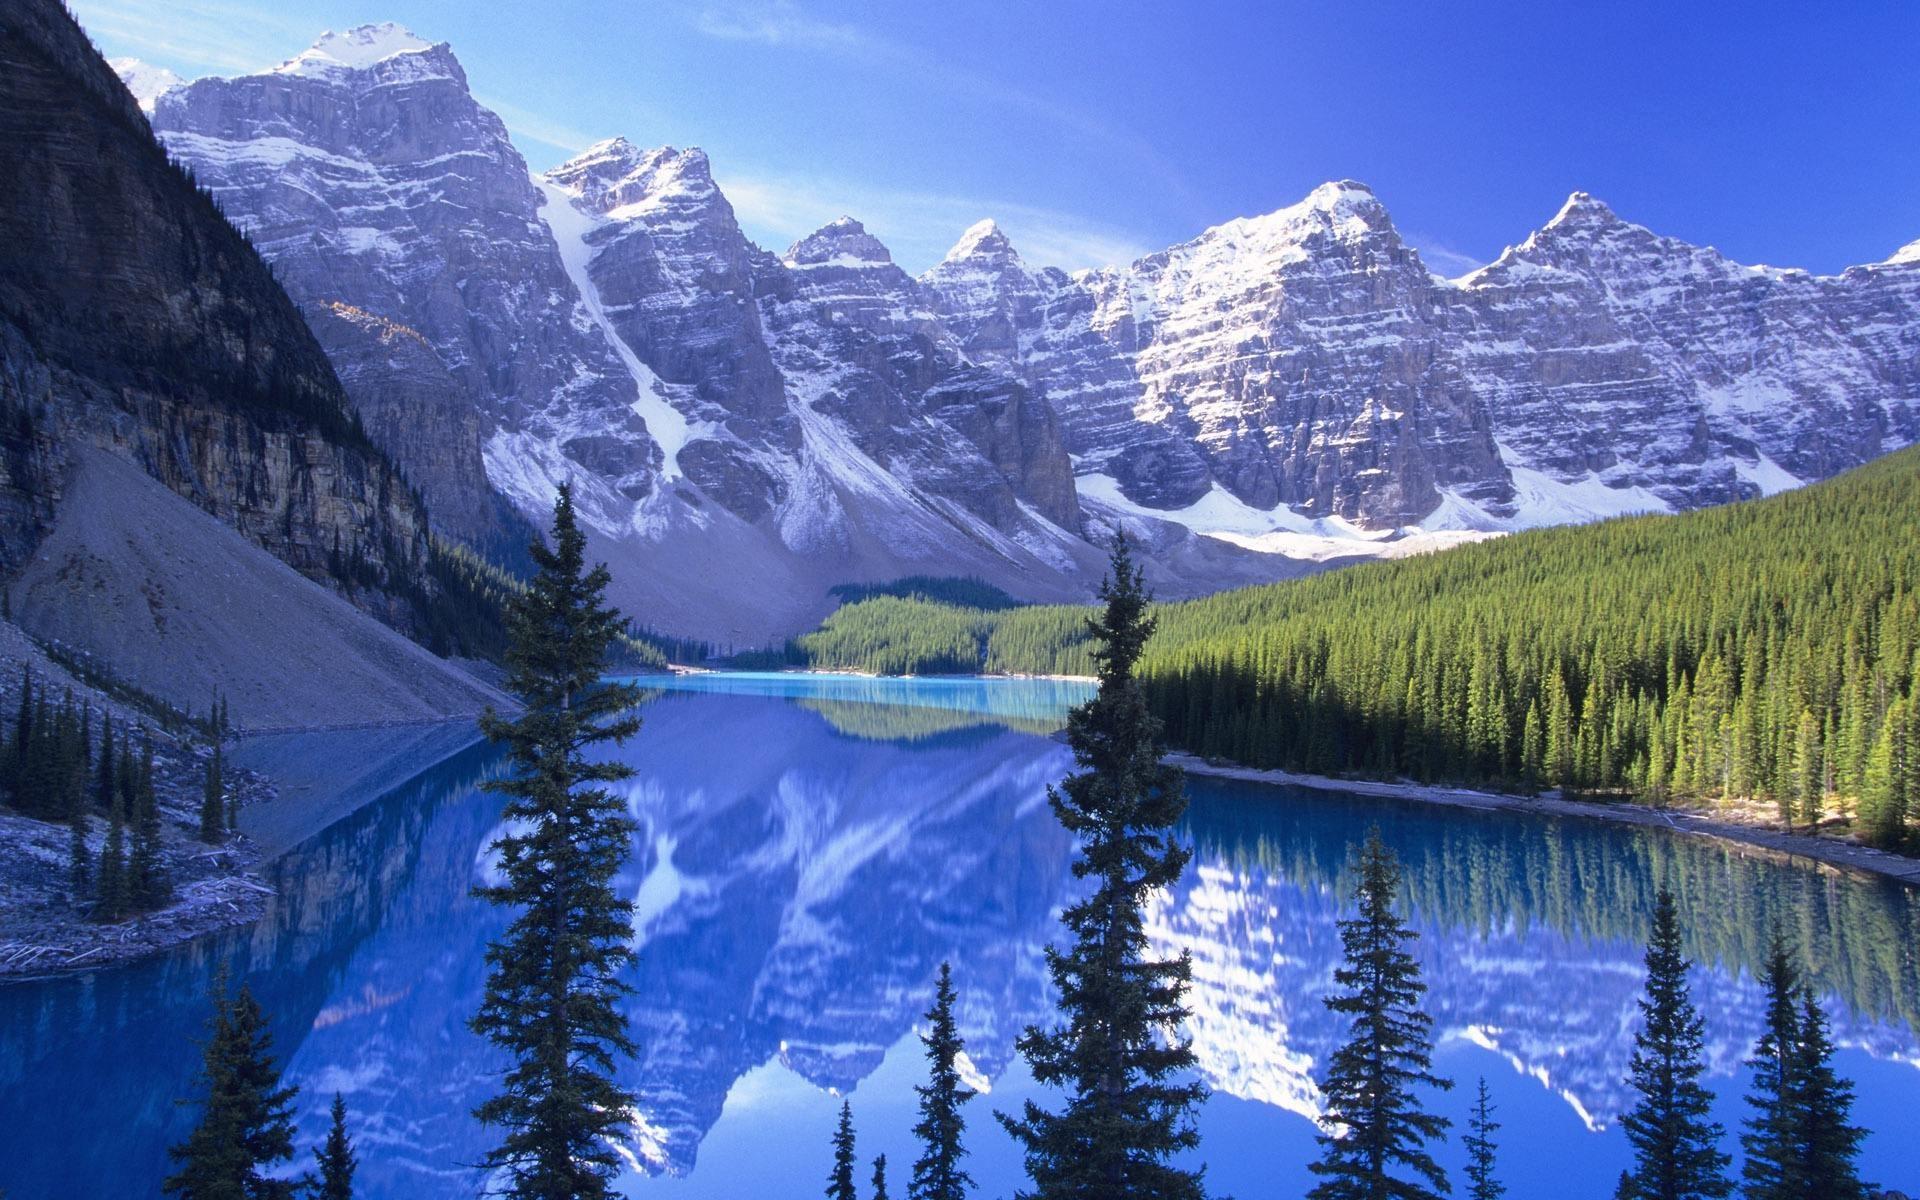 Snowy Mountains Wallpaper | Wallpaper Download